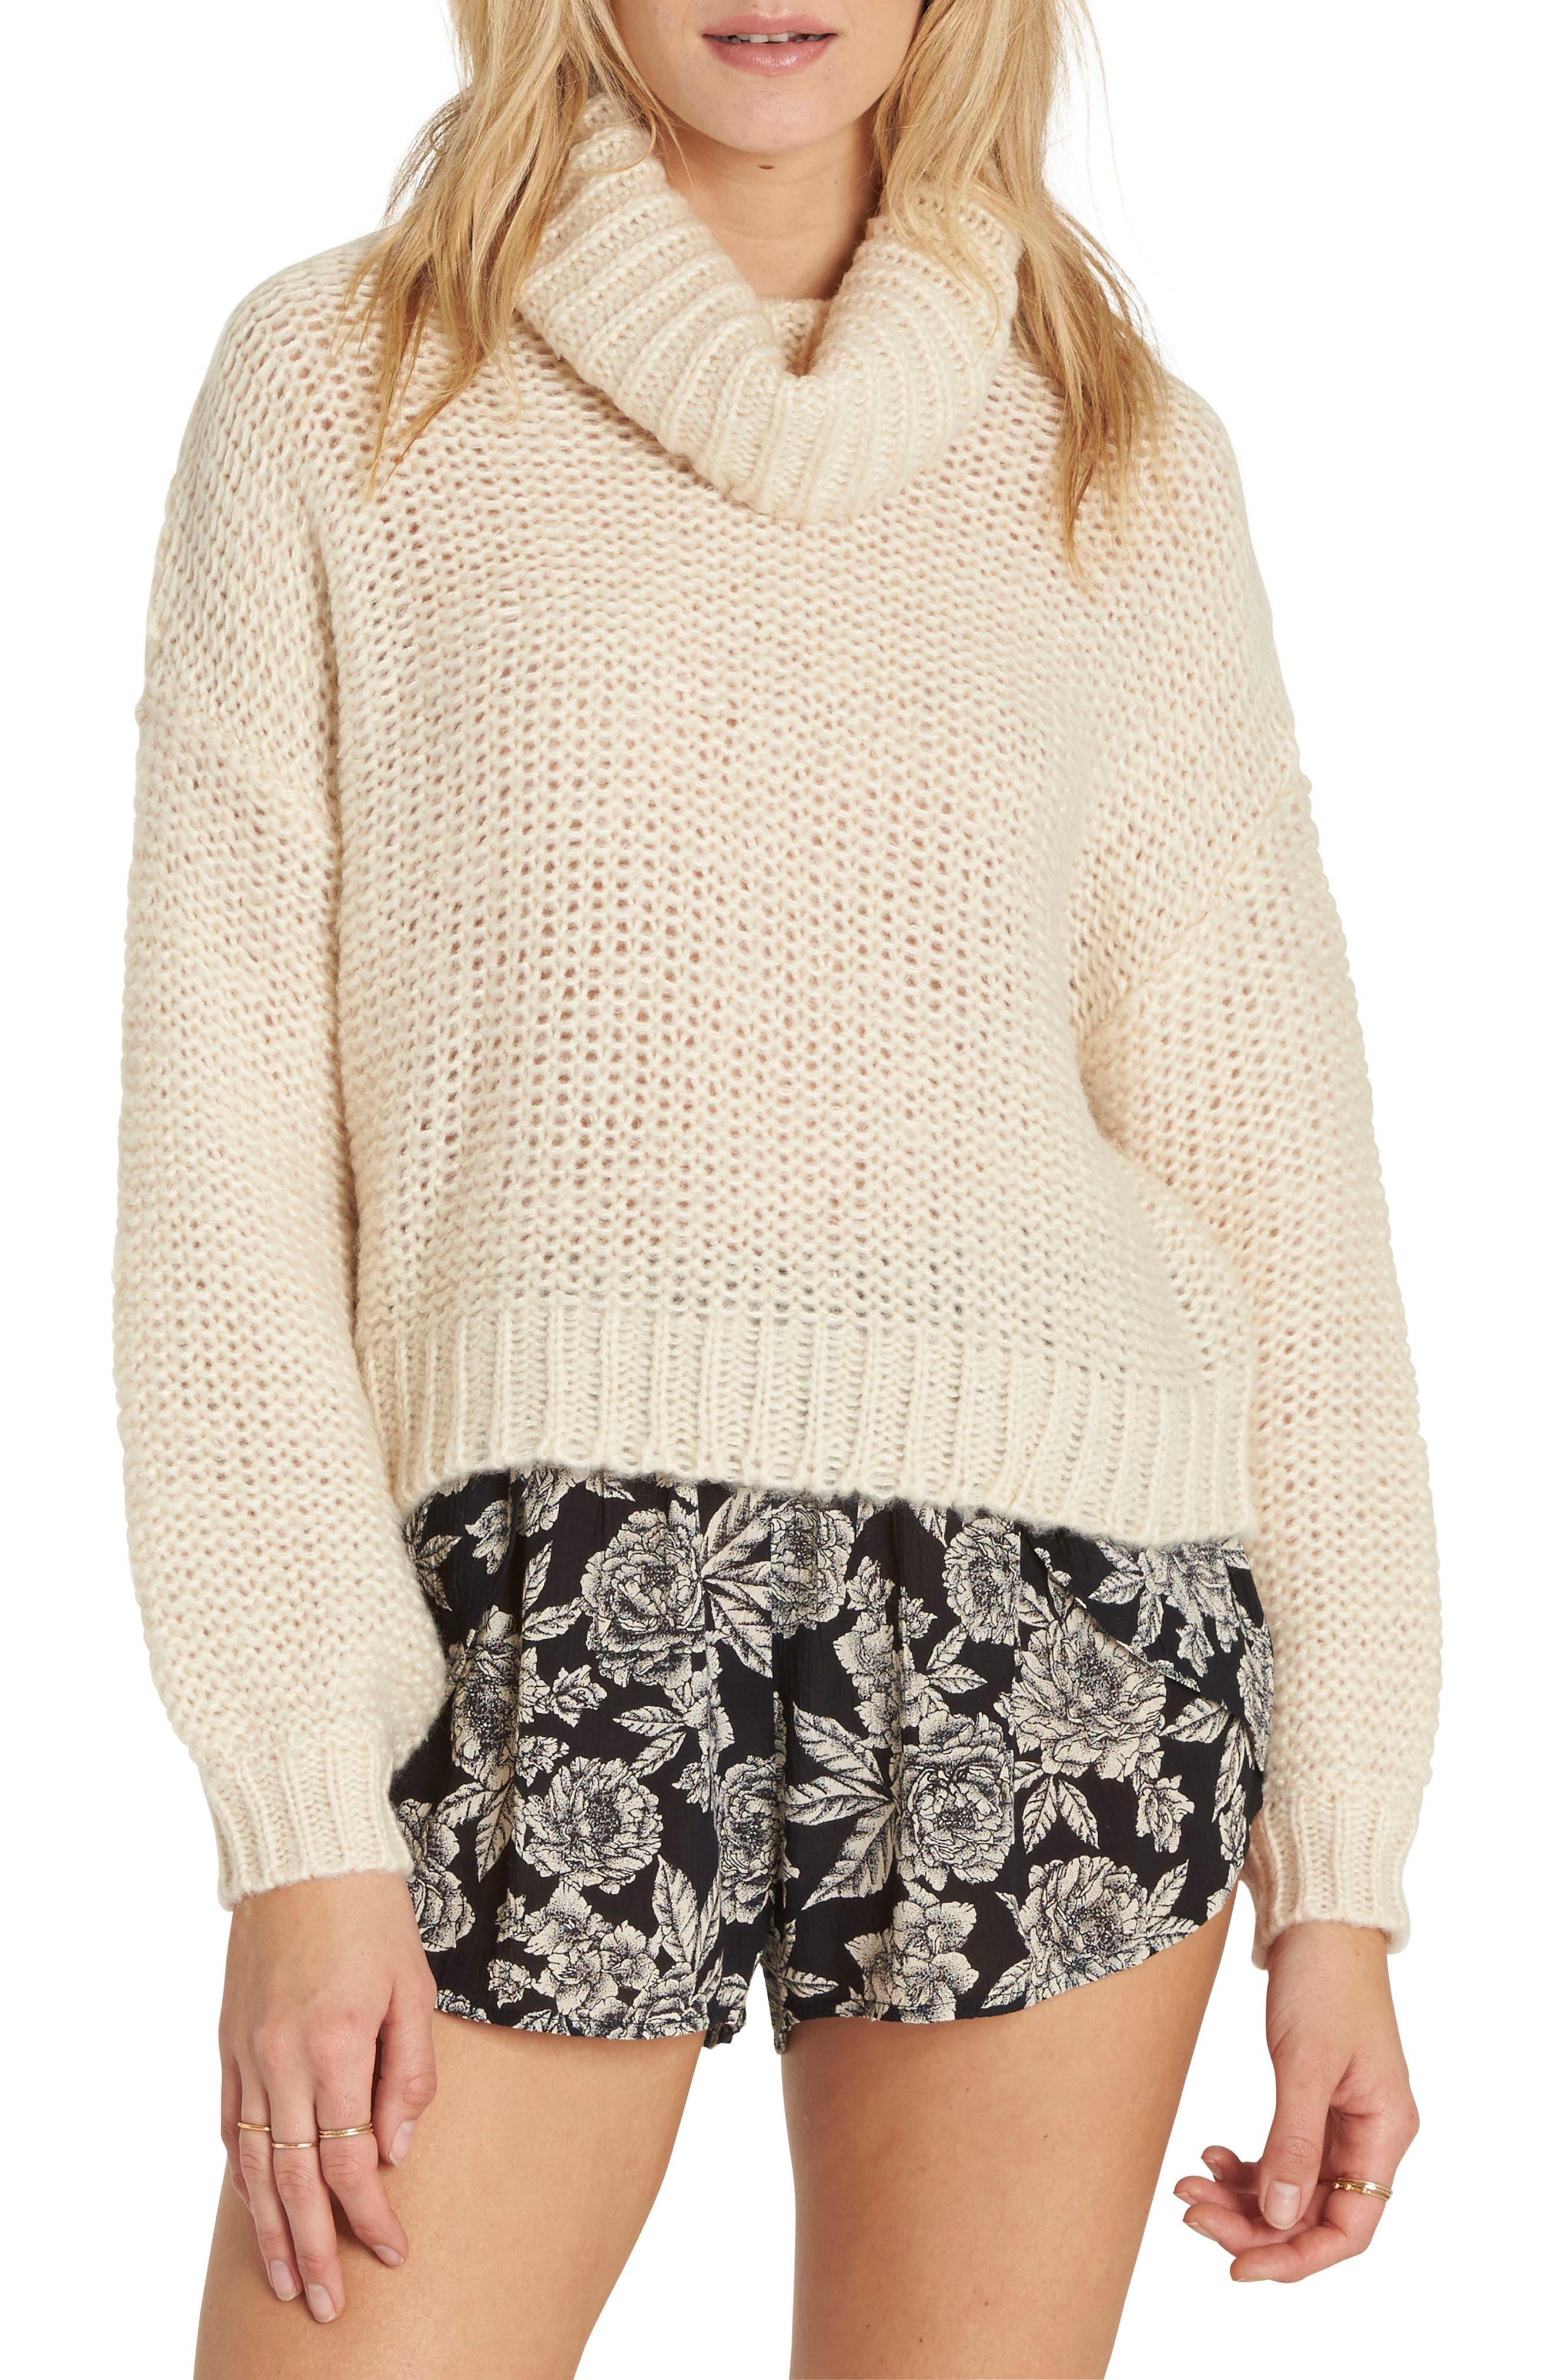 Alternate Image 1 Selected - Billabong Stay Here Turtleneck Sweater